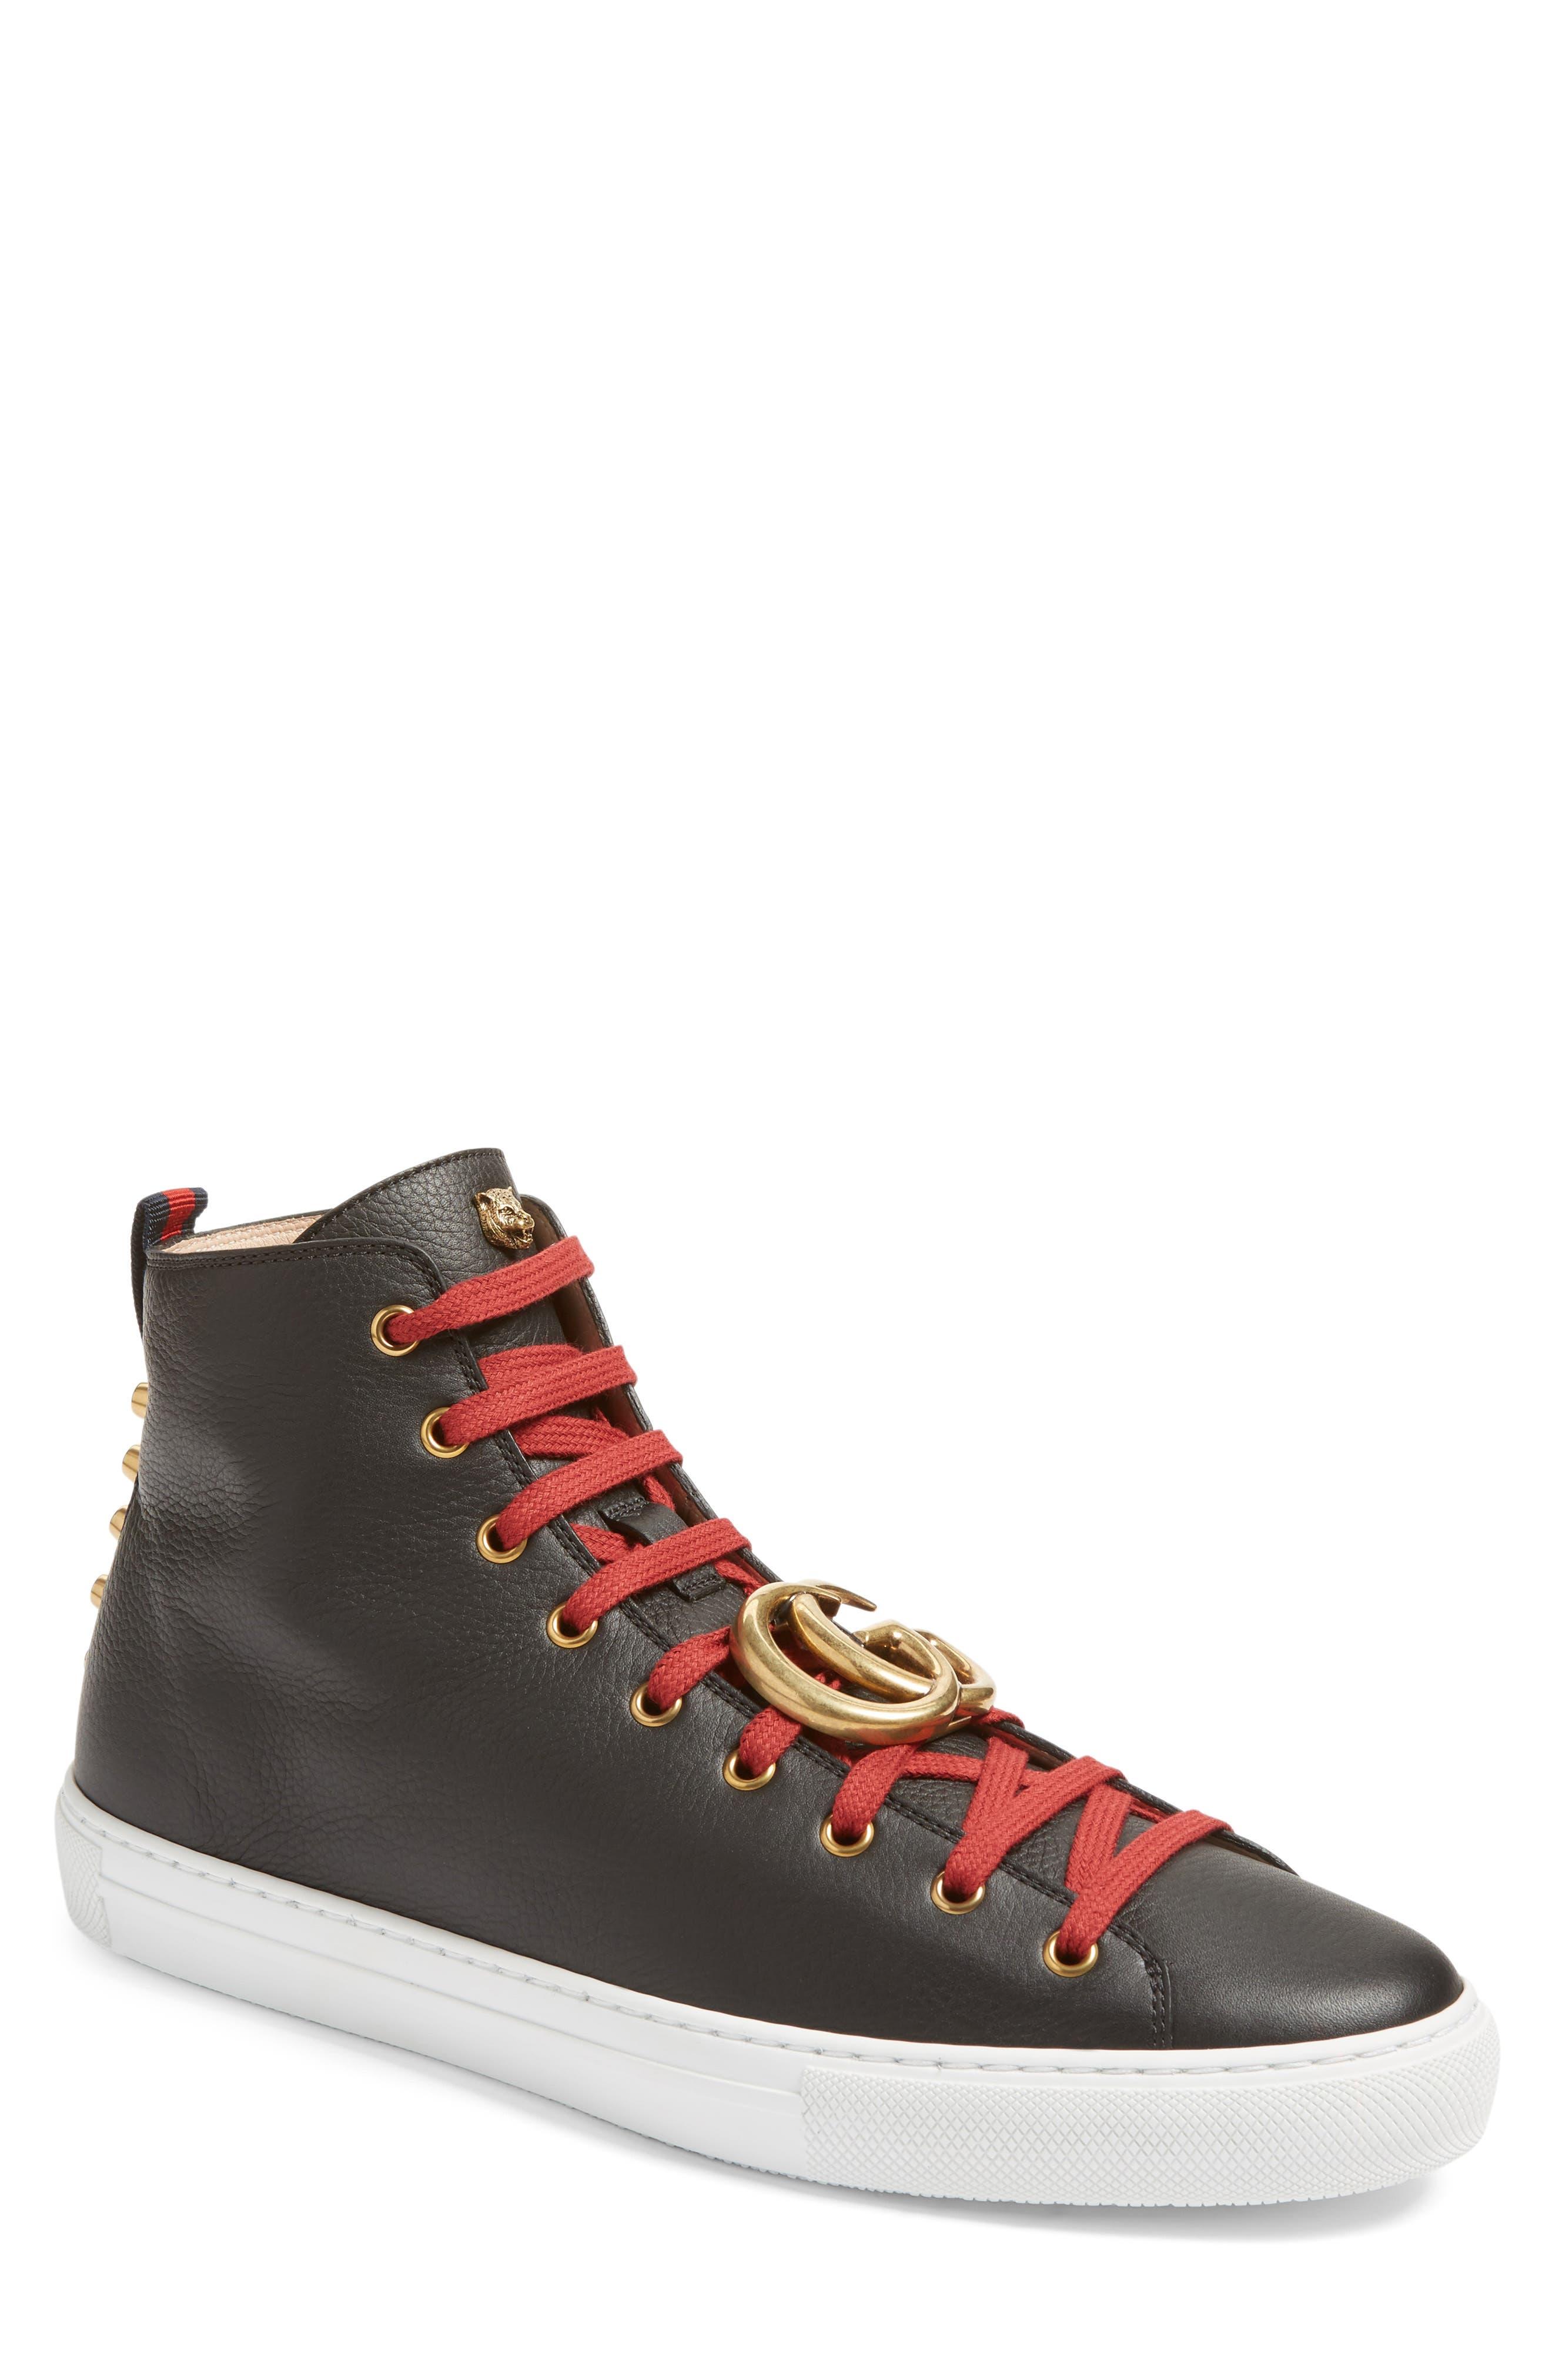 Major High Top Sneaker,                         Main,                         color, 007